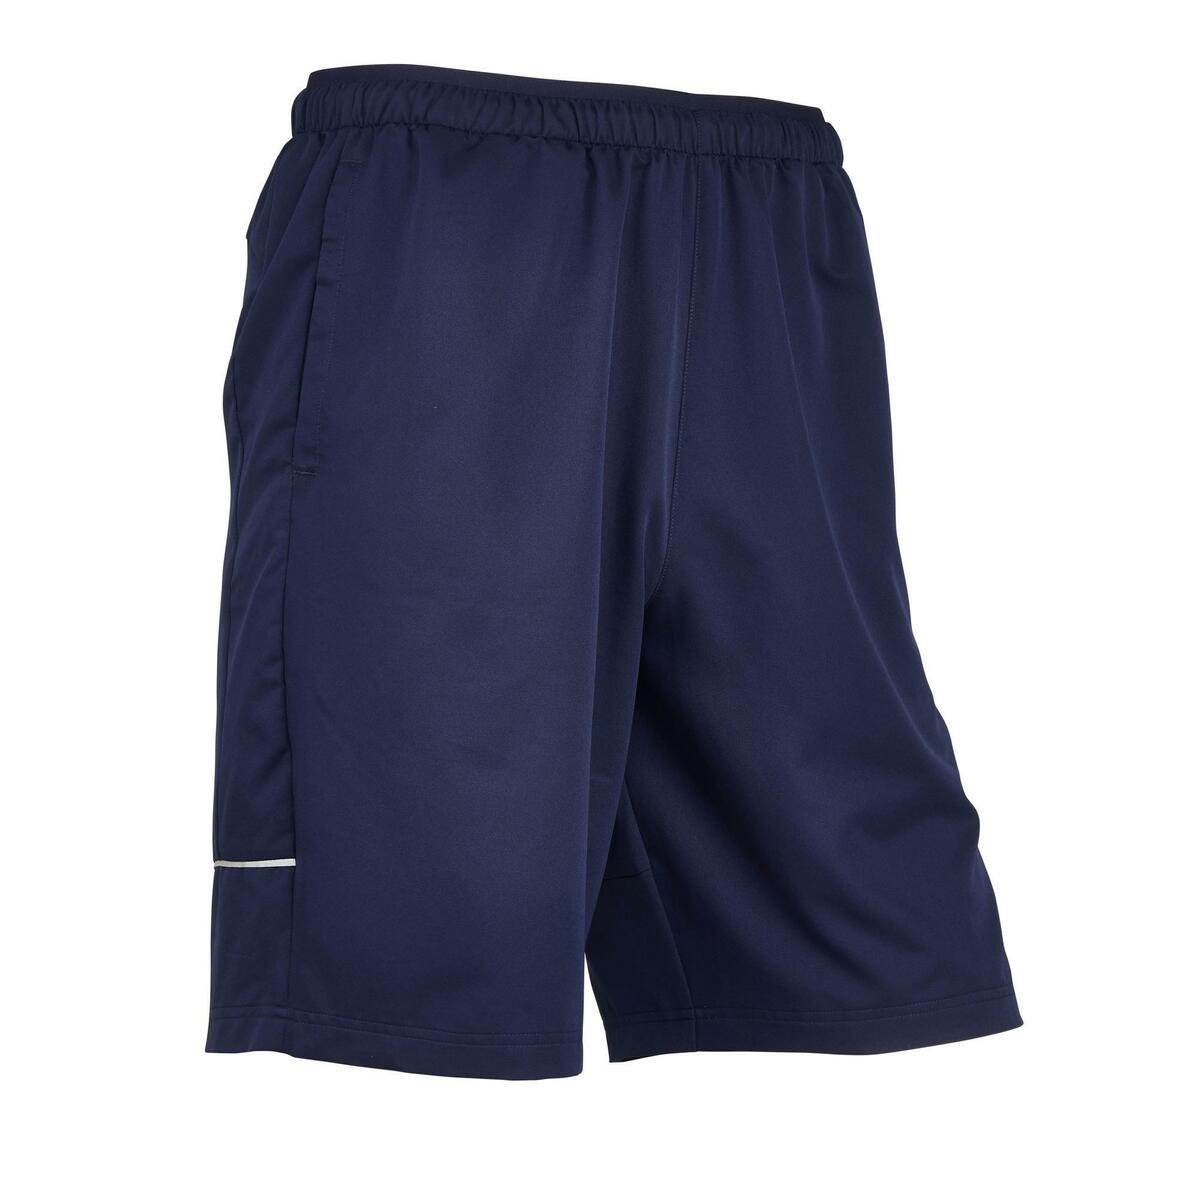 Bild 1 von Sporthose kurz Fitness Herren blau